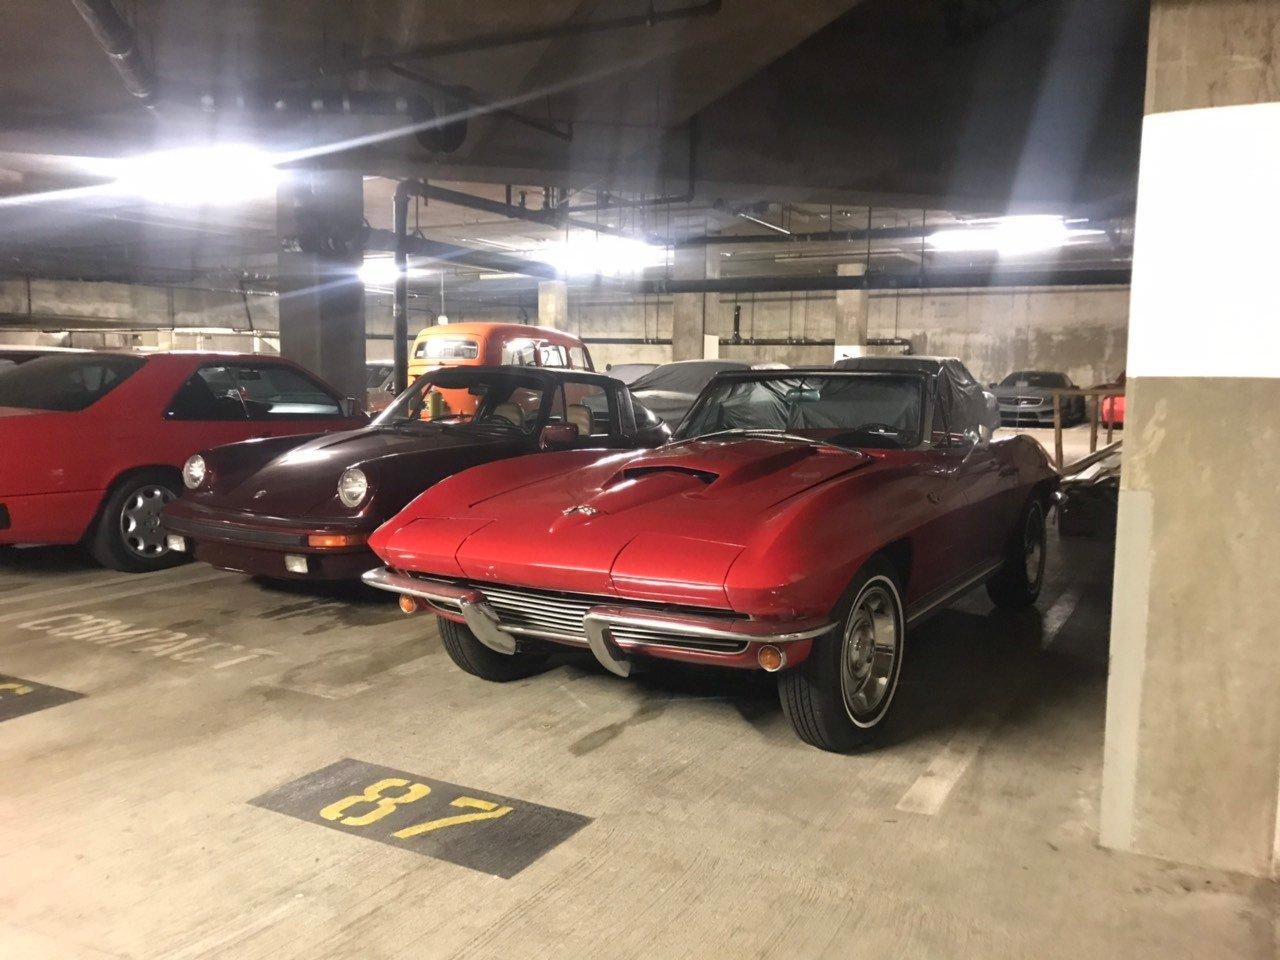 1964 Chevrolet Corvette C2 for sale #109167 | MCG